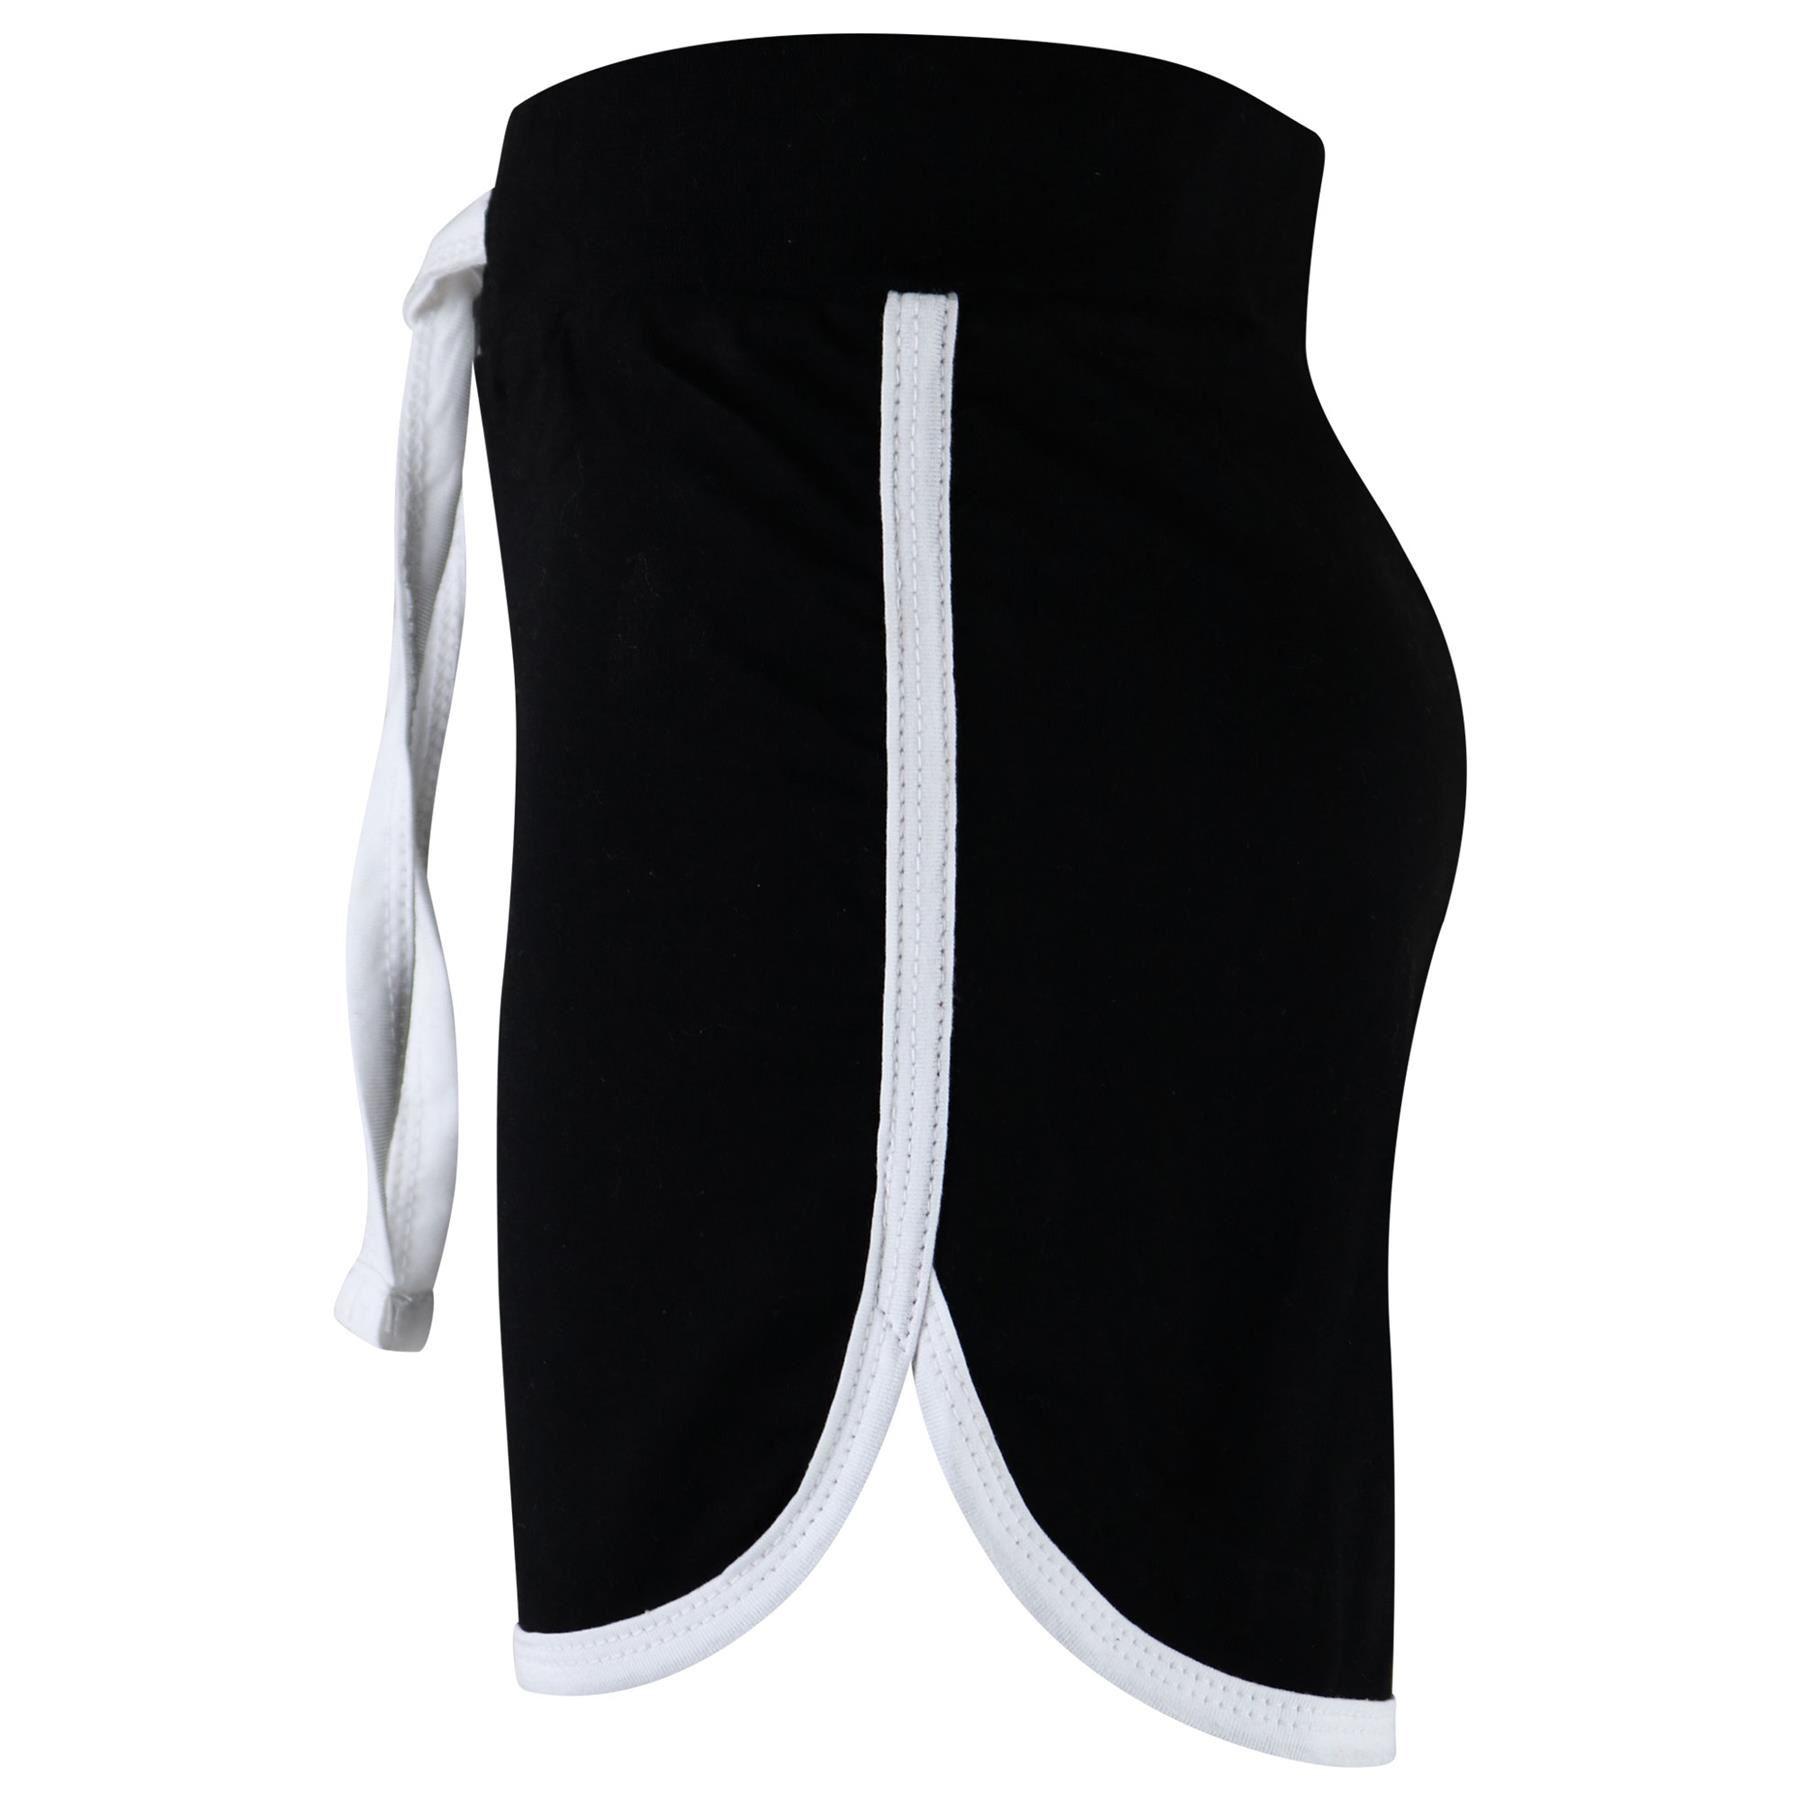 Kids-Girls-Shorts-100-Cotton-Dance-Gym-Sports-Summer-Hot-Short-Pants-2-13-Years Indexbild 7